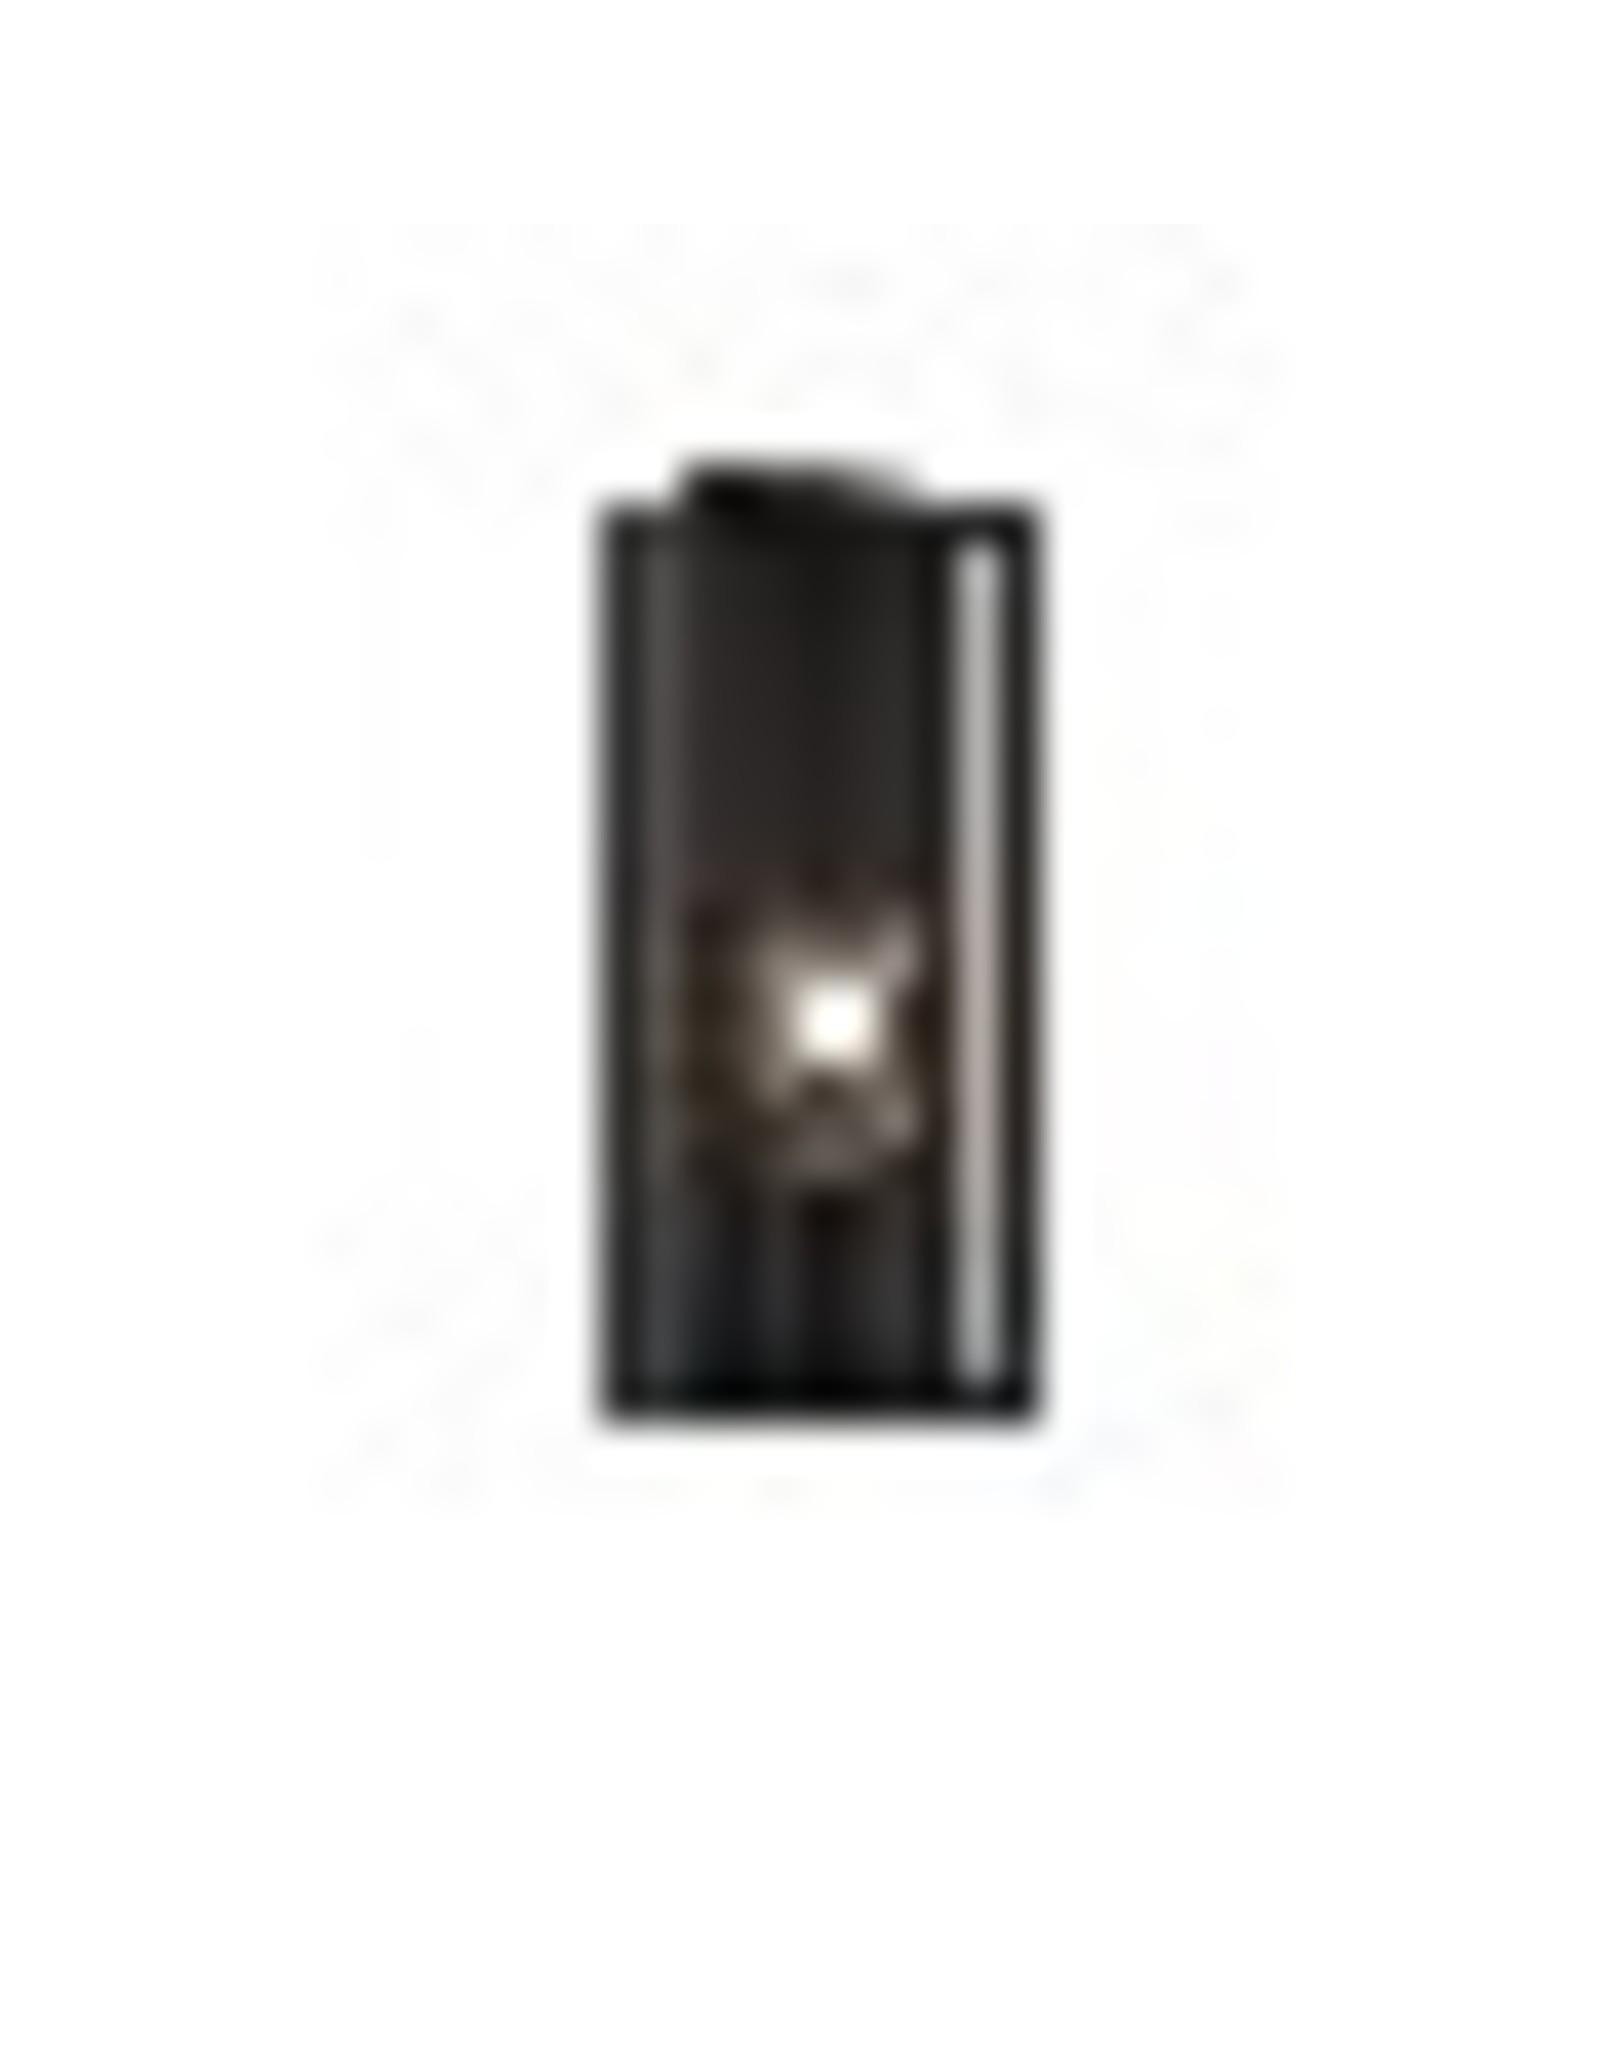 psm lighting Wandopbouw A60 E27 60W 230V inox 316 2x beh.